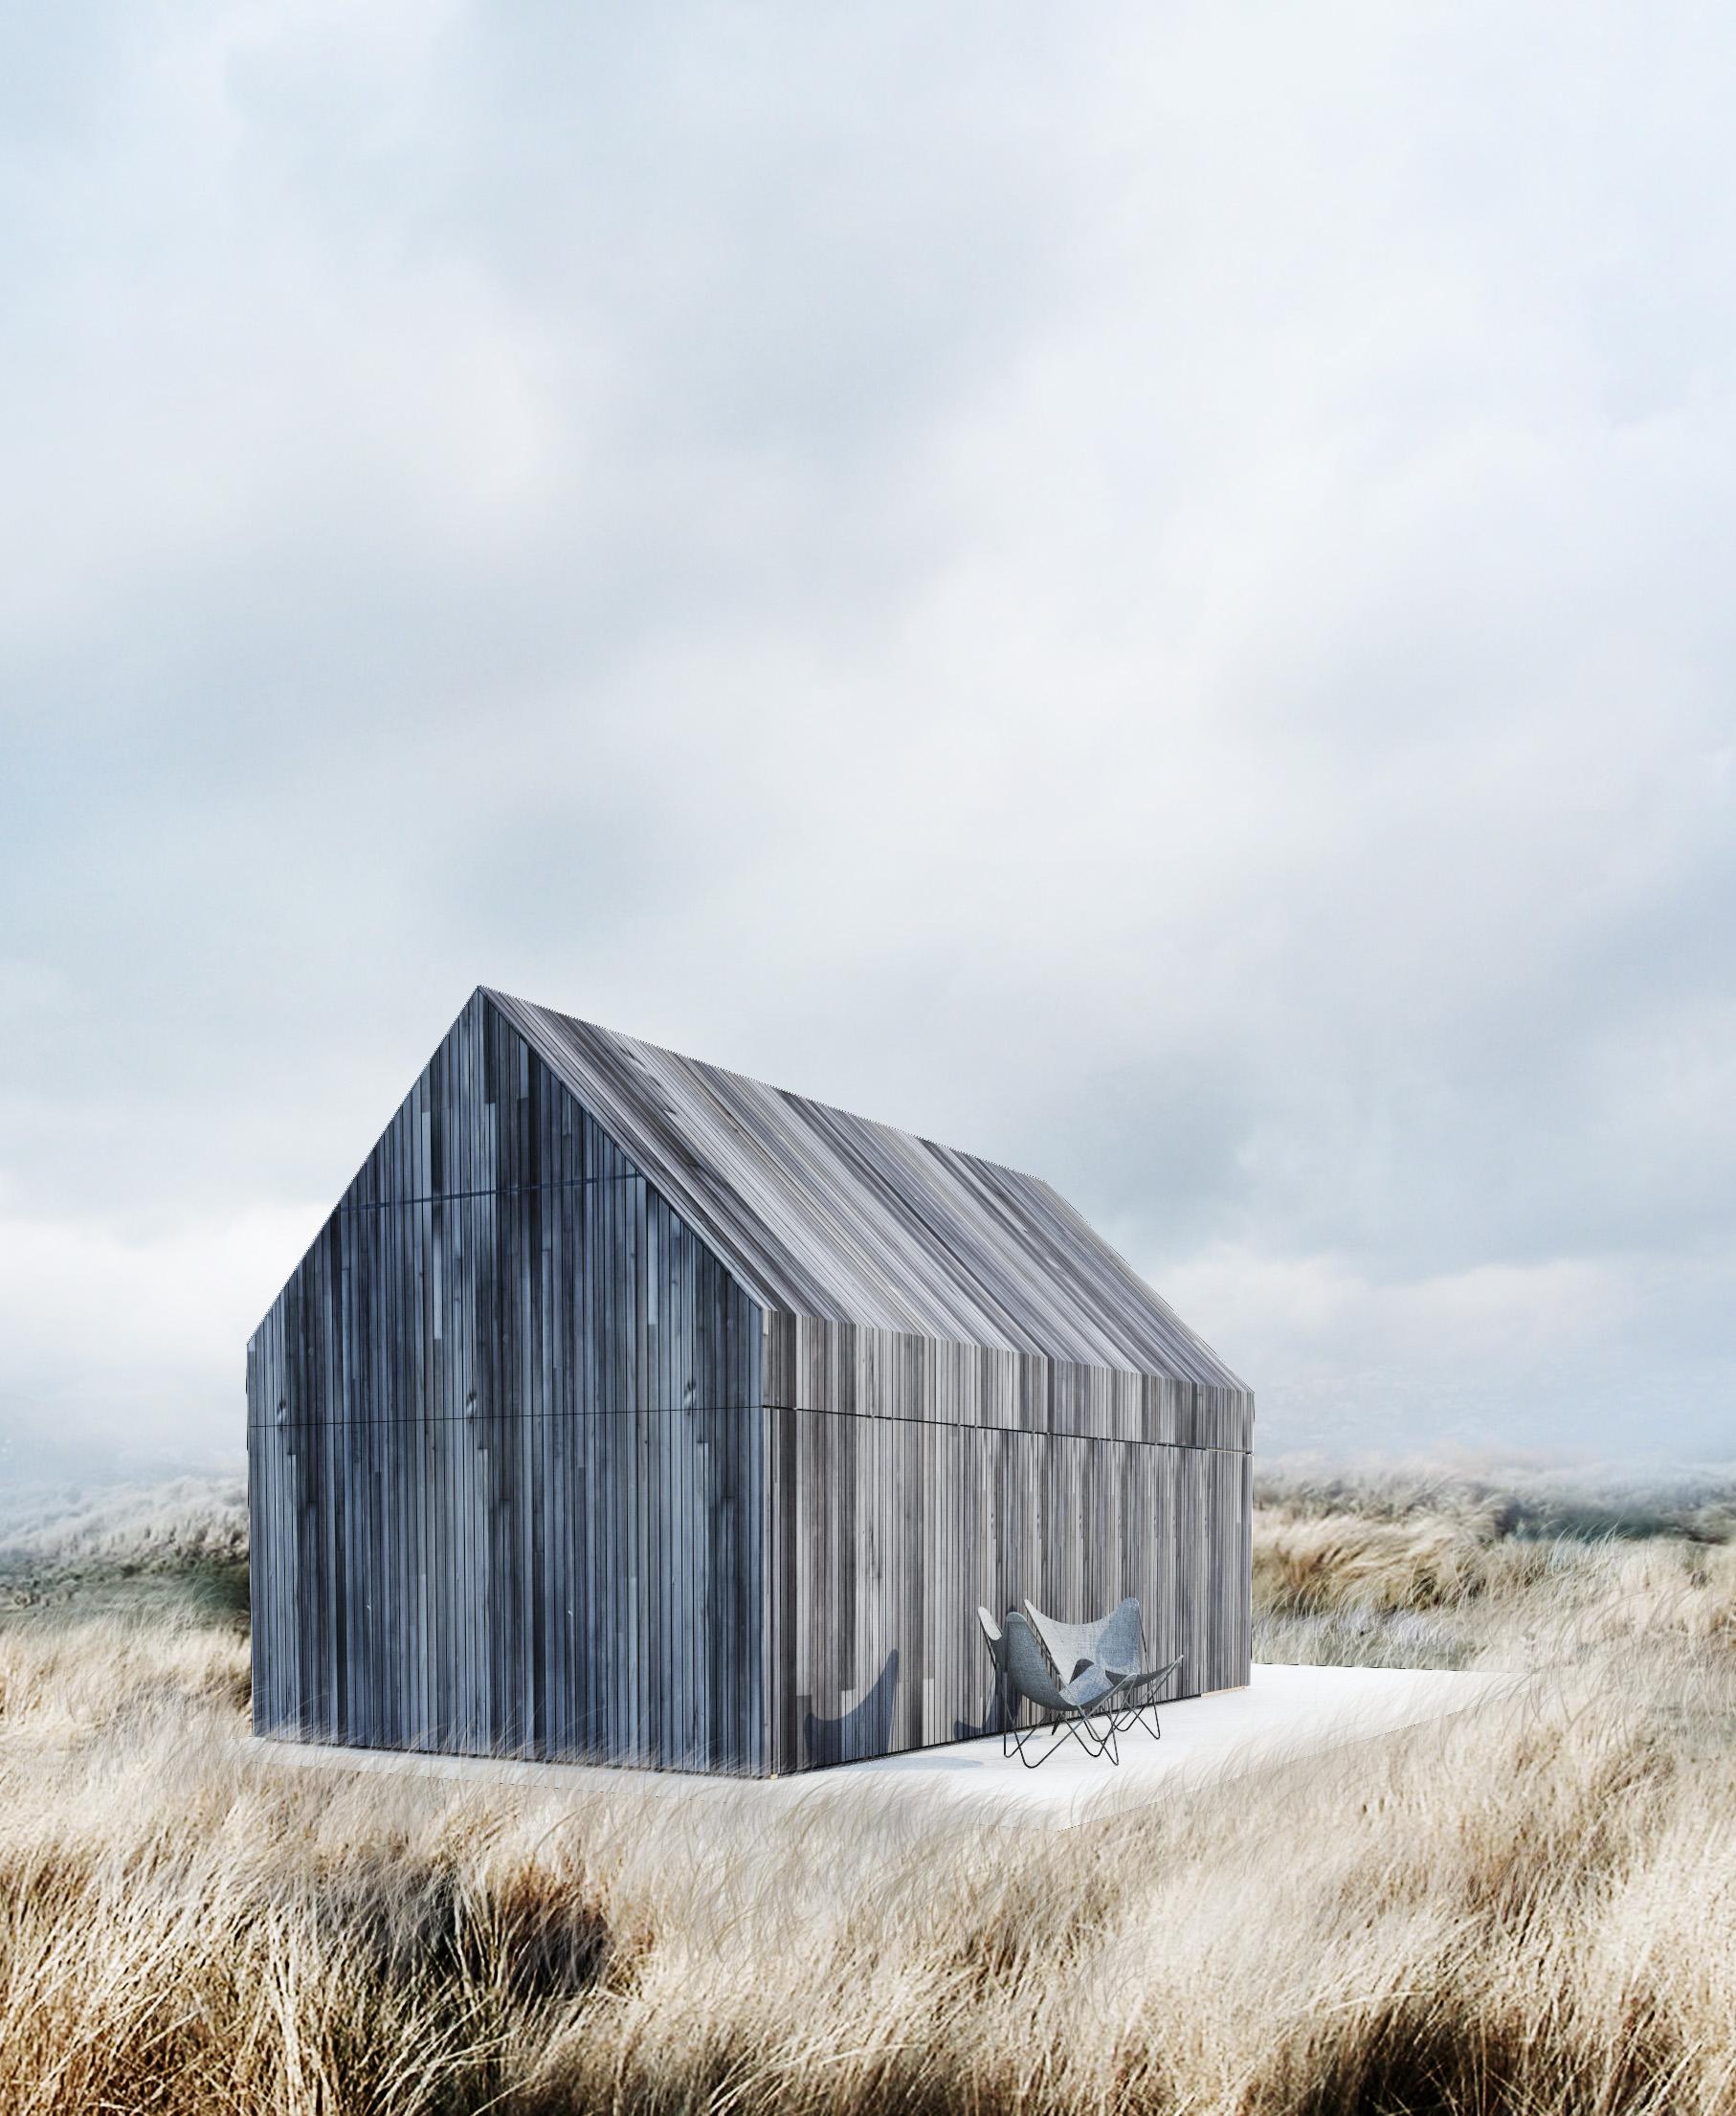 06_WE Architecture_Boathouse_render_2_2.jpg